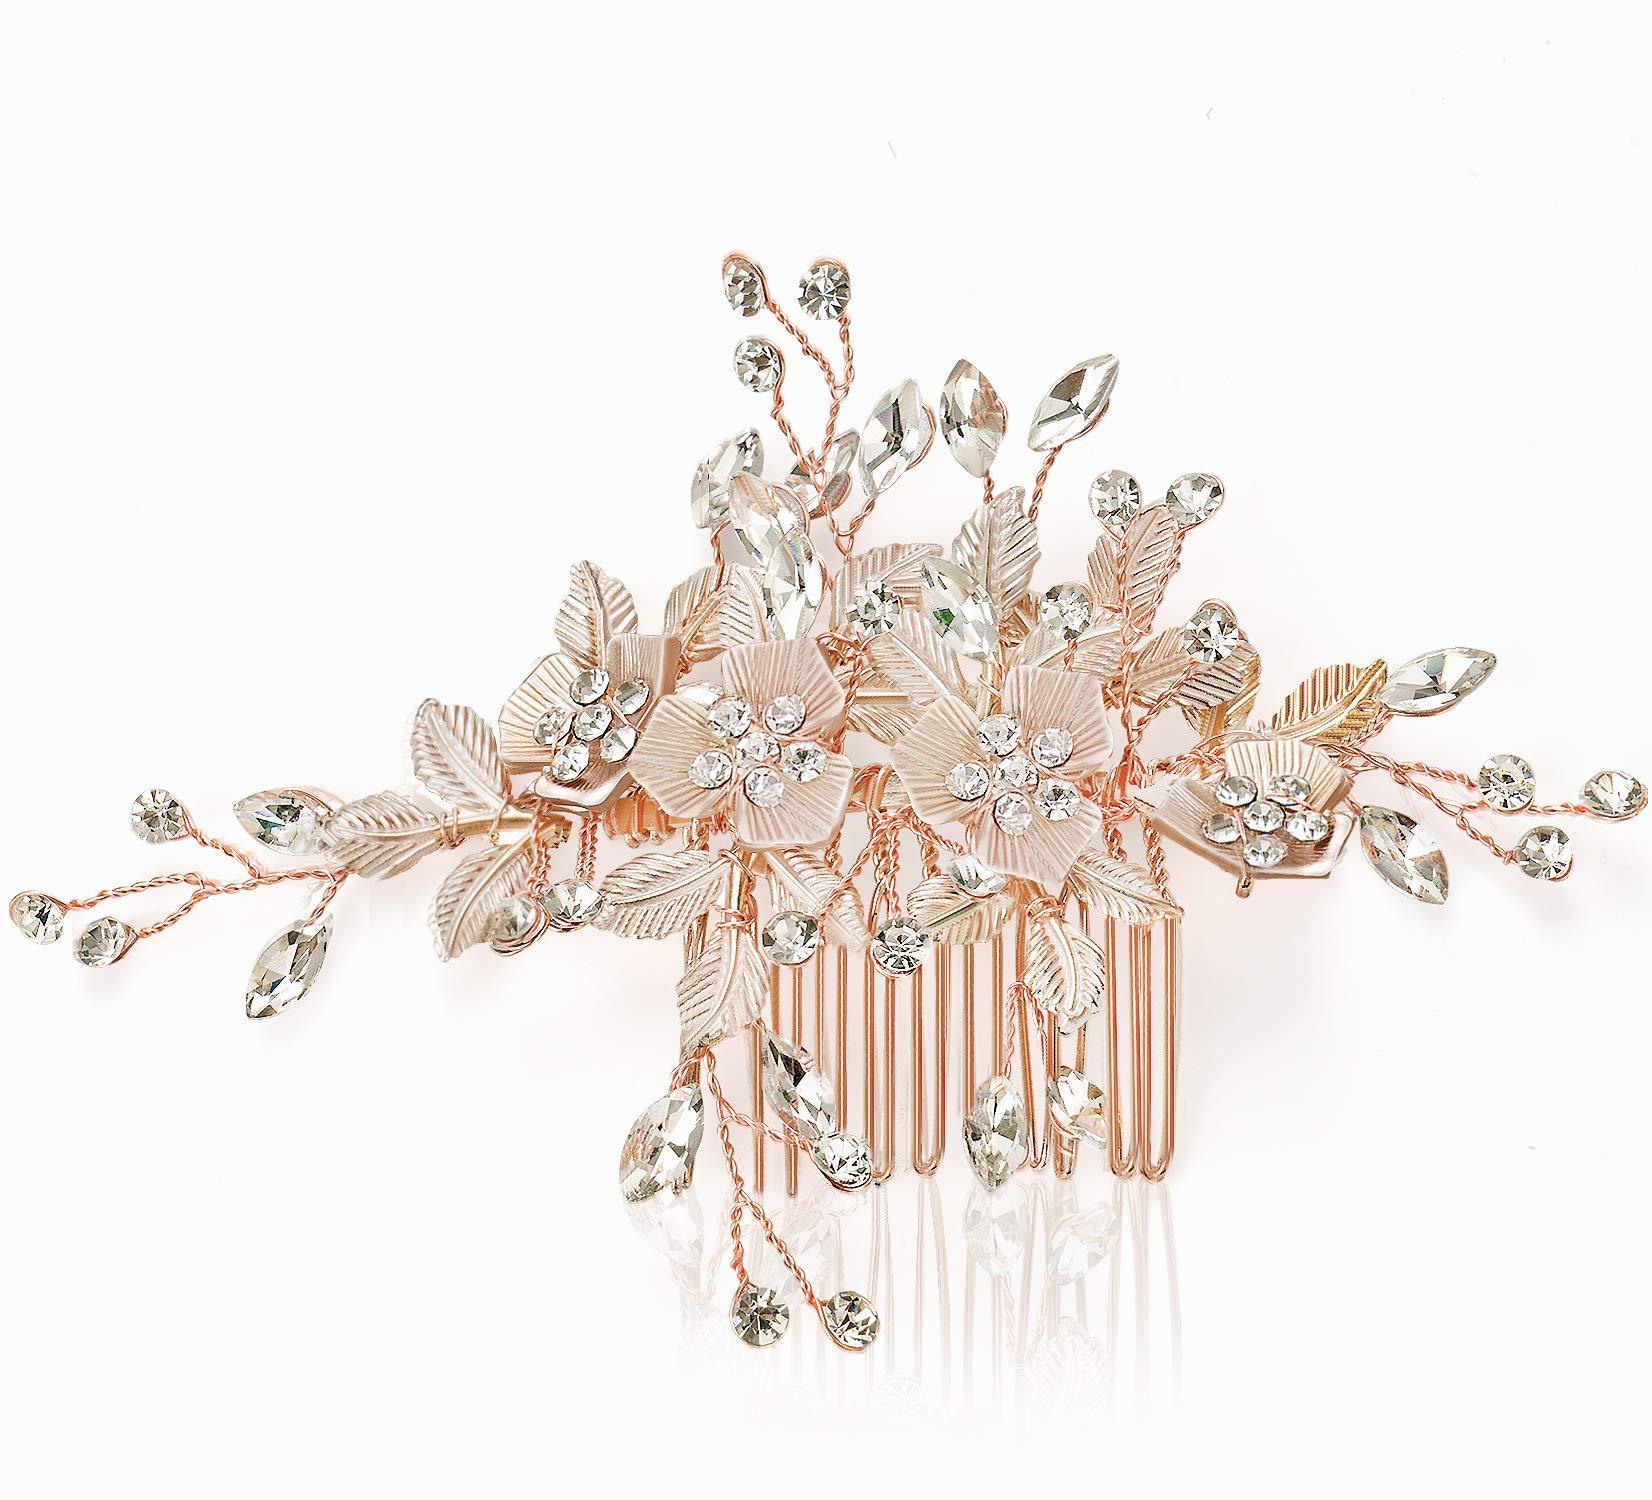 JOYPEA Hair Side Combs Rose Gold, Tiara Comb Clip Rhinestone,Bridal Combs Wedding Clip Hair Comb Flower CombsForWomen by JOYPEA